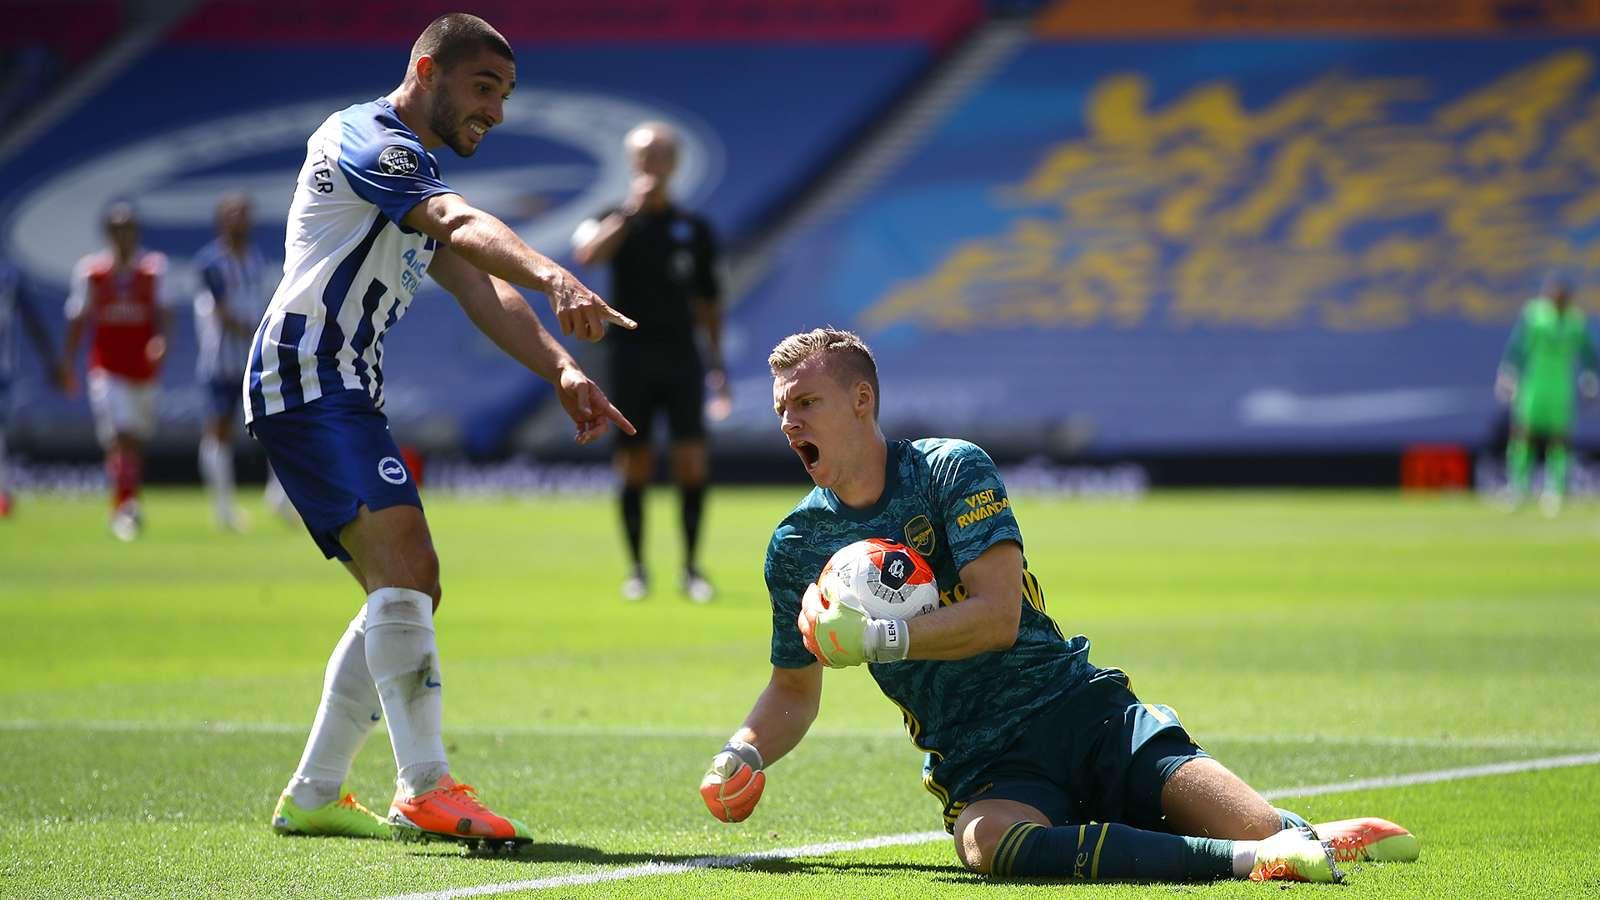 Neal Maupay Bernd Leno Brighton Arsenal 2019-20